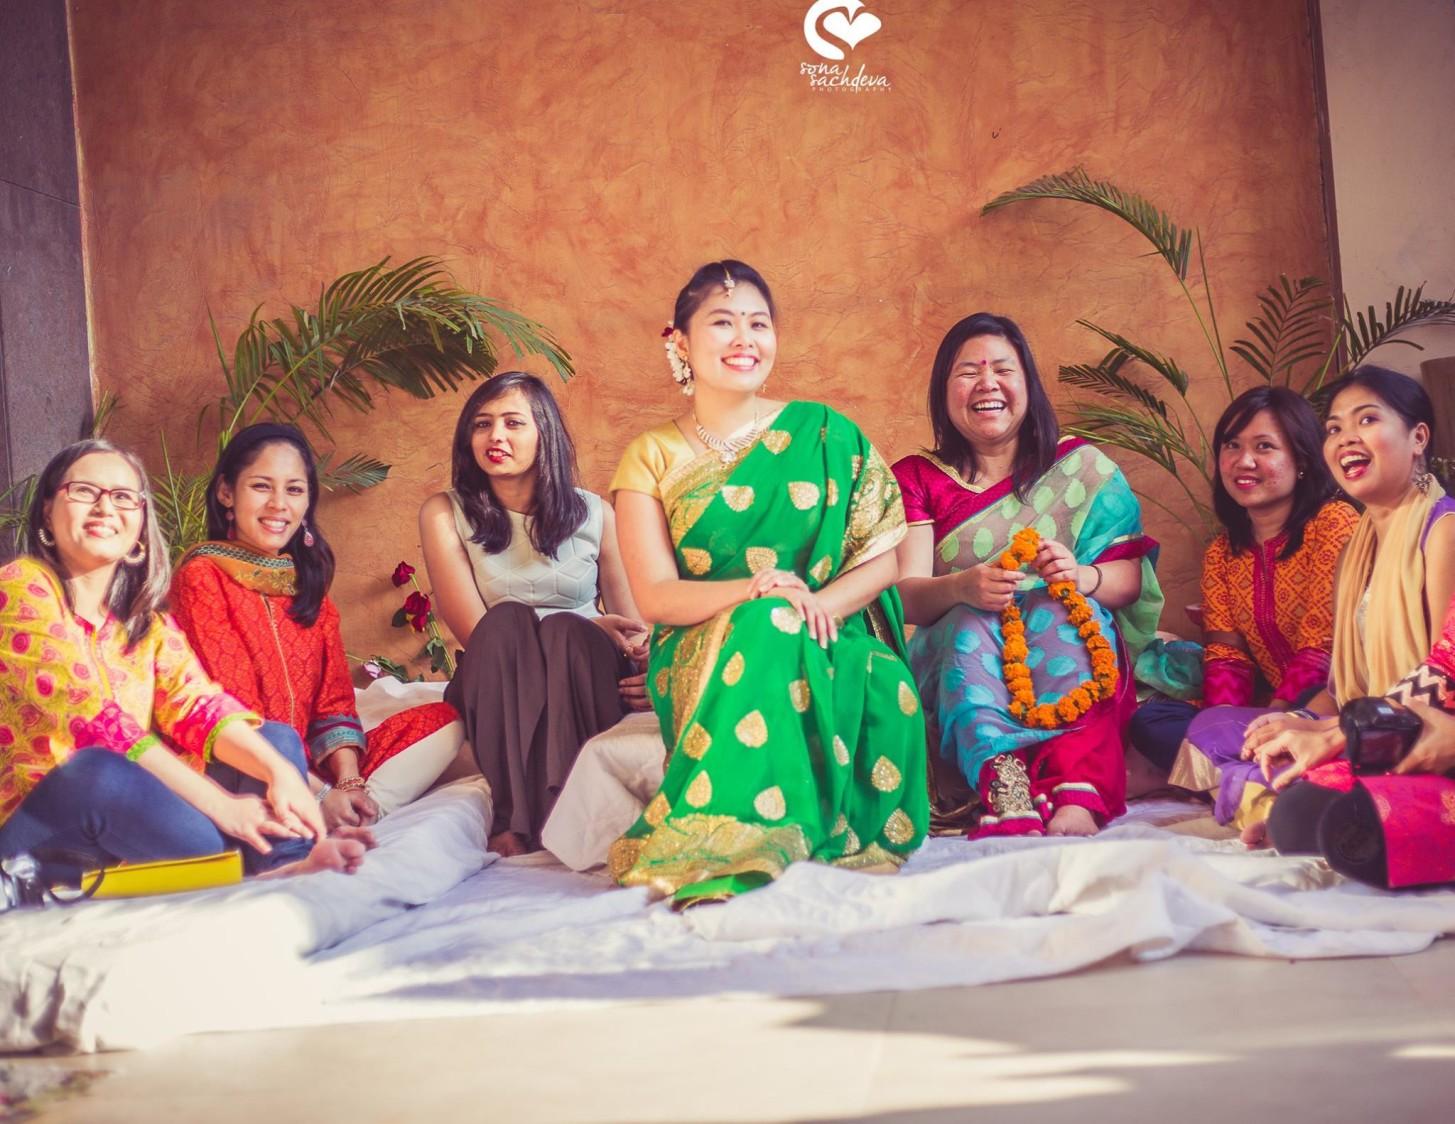 Wonderful shot capturing bliss by Sona Sachdeva Photography Wedding-photography | Weddings Photos & Ideas